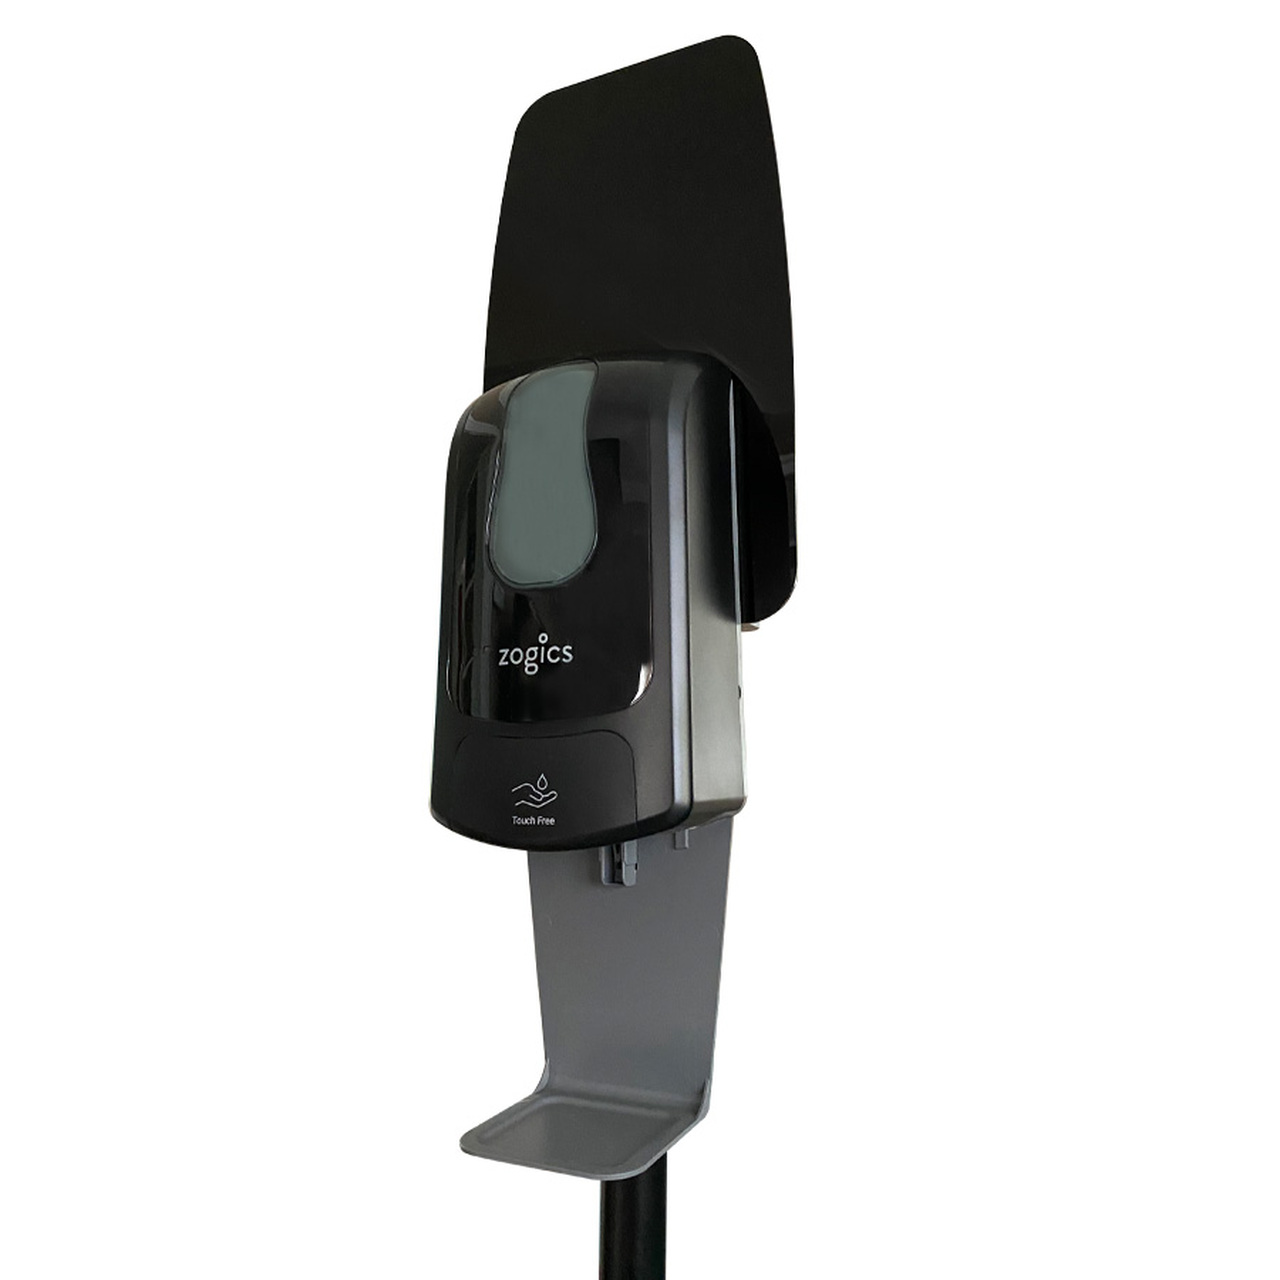 Zogics Touch-Free Floor Stand Hand Sanitizer Dispenser